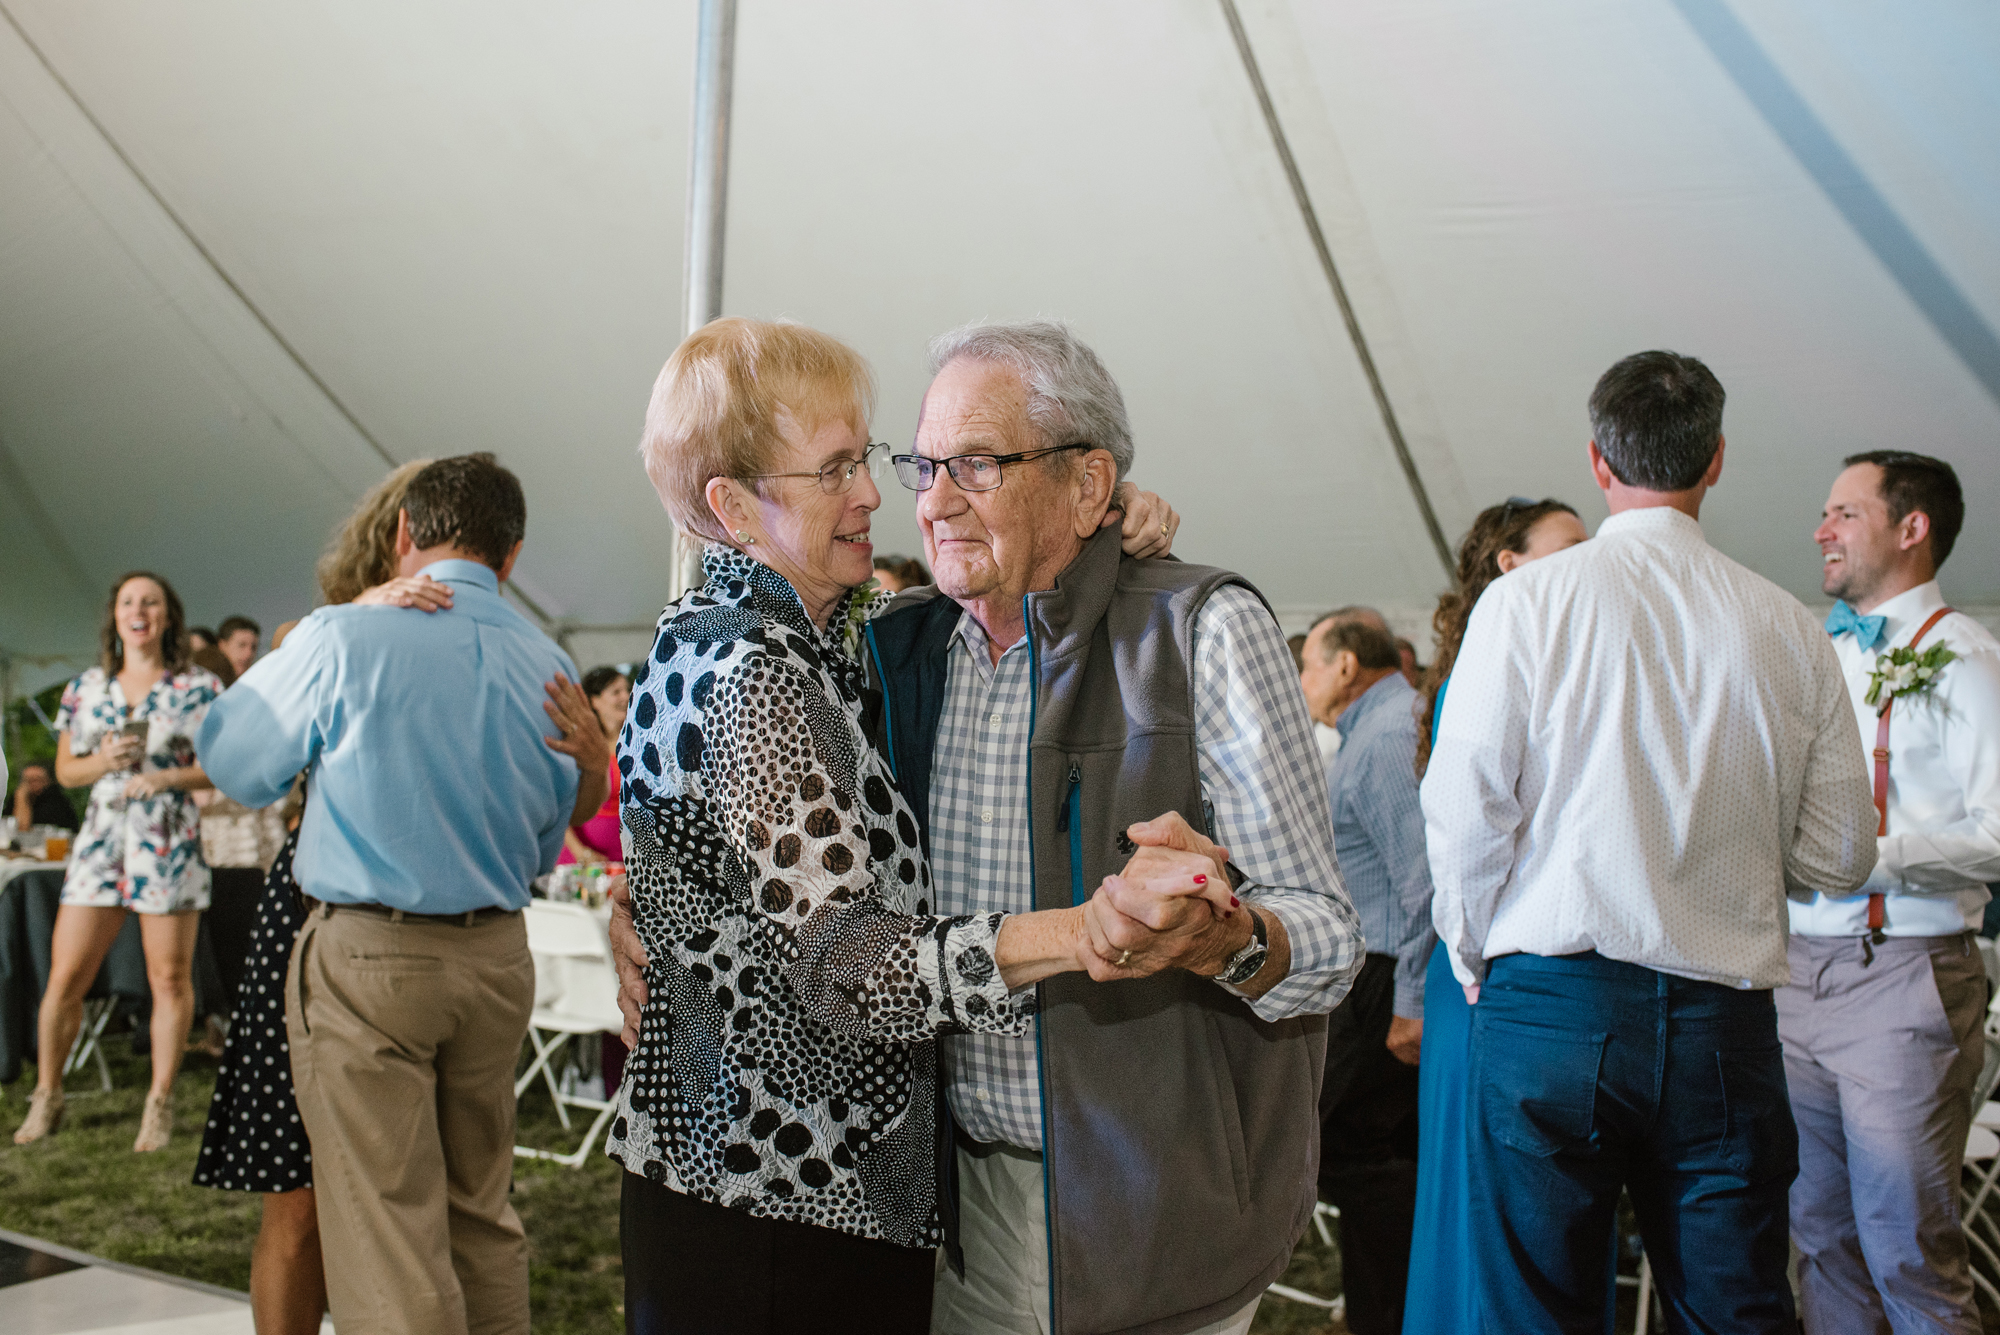 Quincy-Coldwater-Michigan-farm-wedding-photogapher-sydney-marie (496).jpg